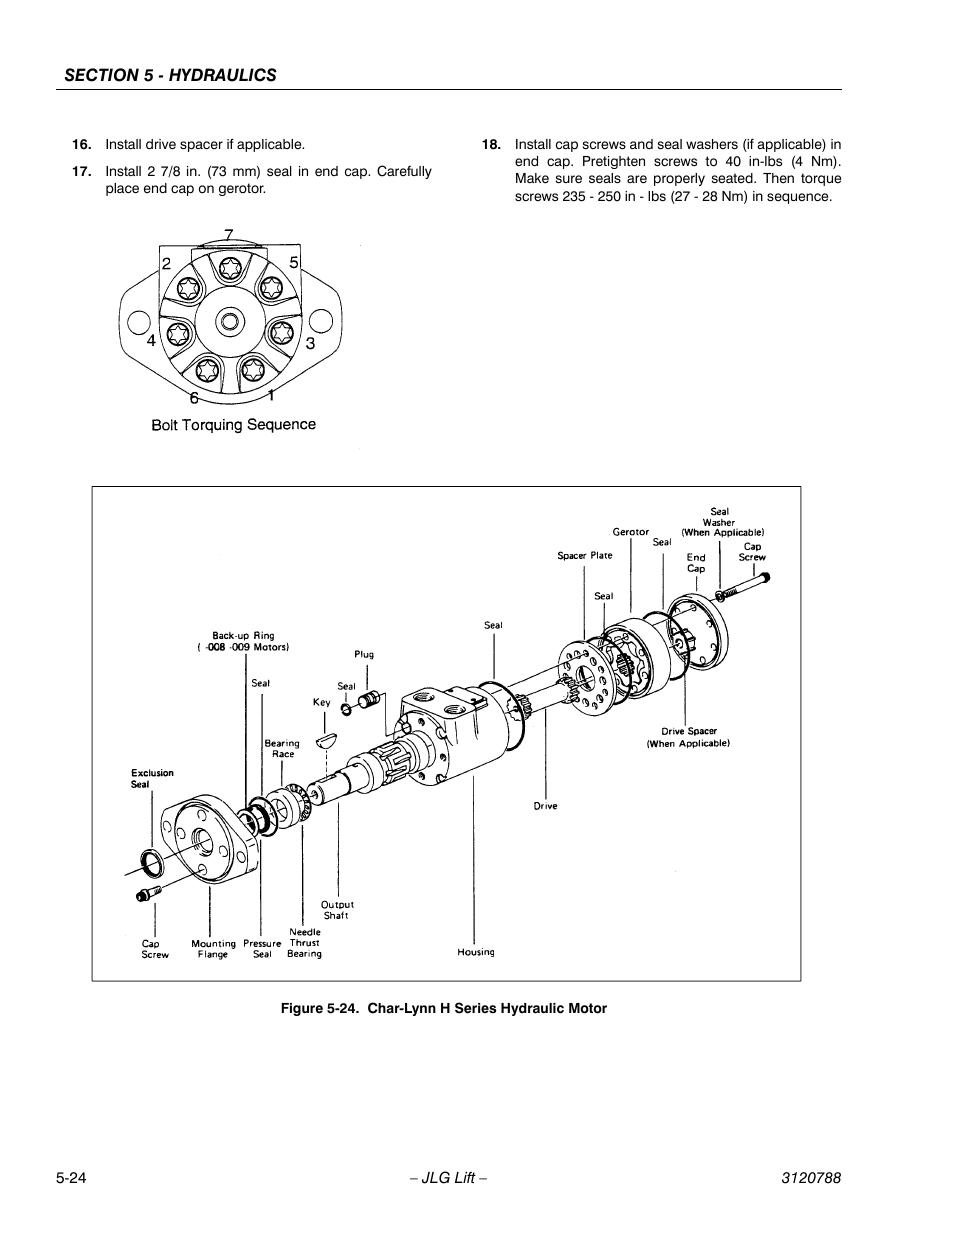 Char Lynn H Series Hydraulic Motor 24 Jlg 460sj Ansi Service Manual User Manual Page 314 464 Original Mode